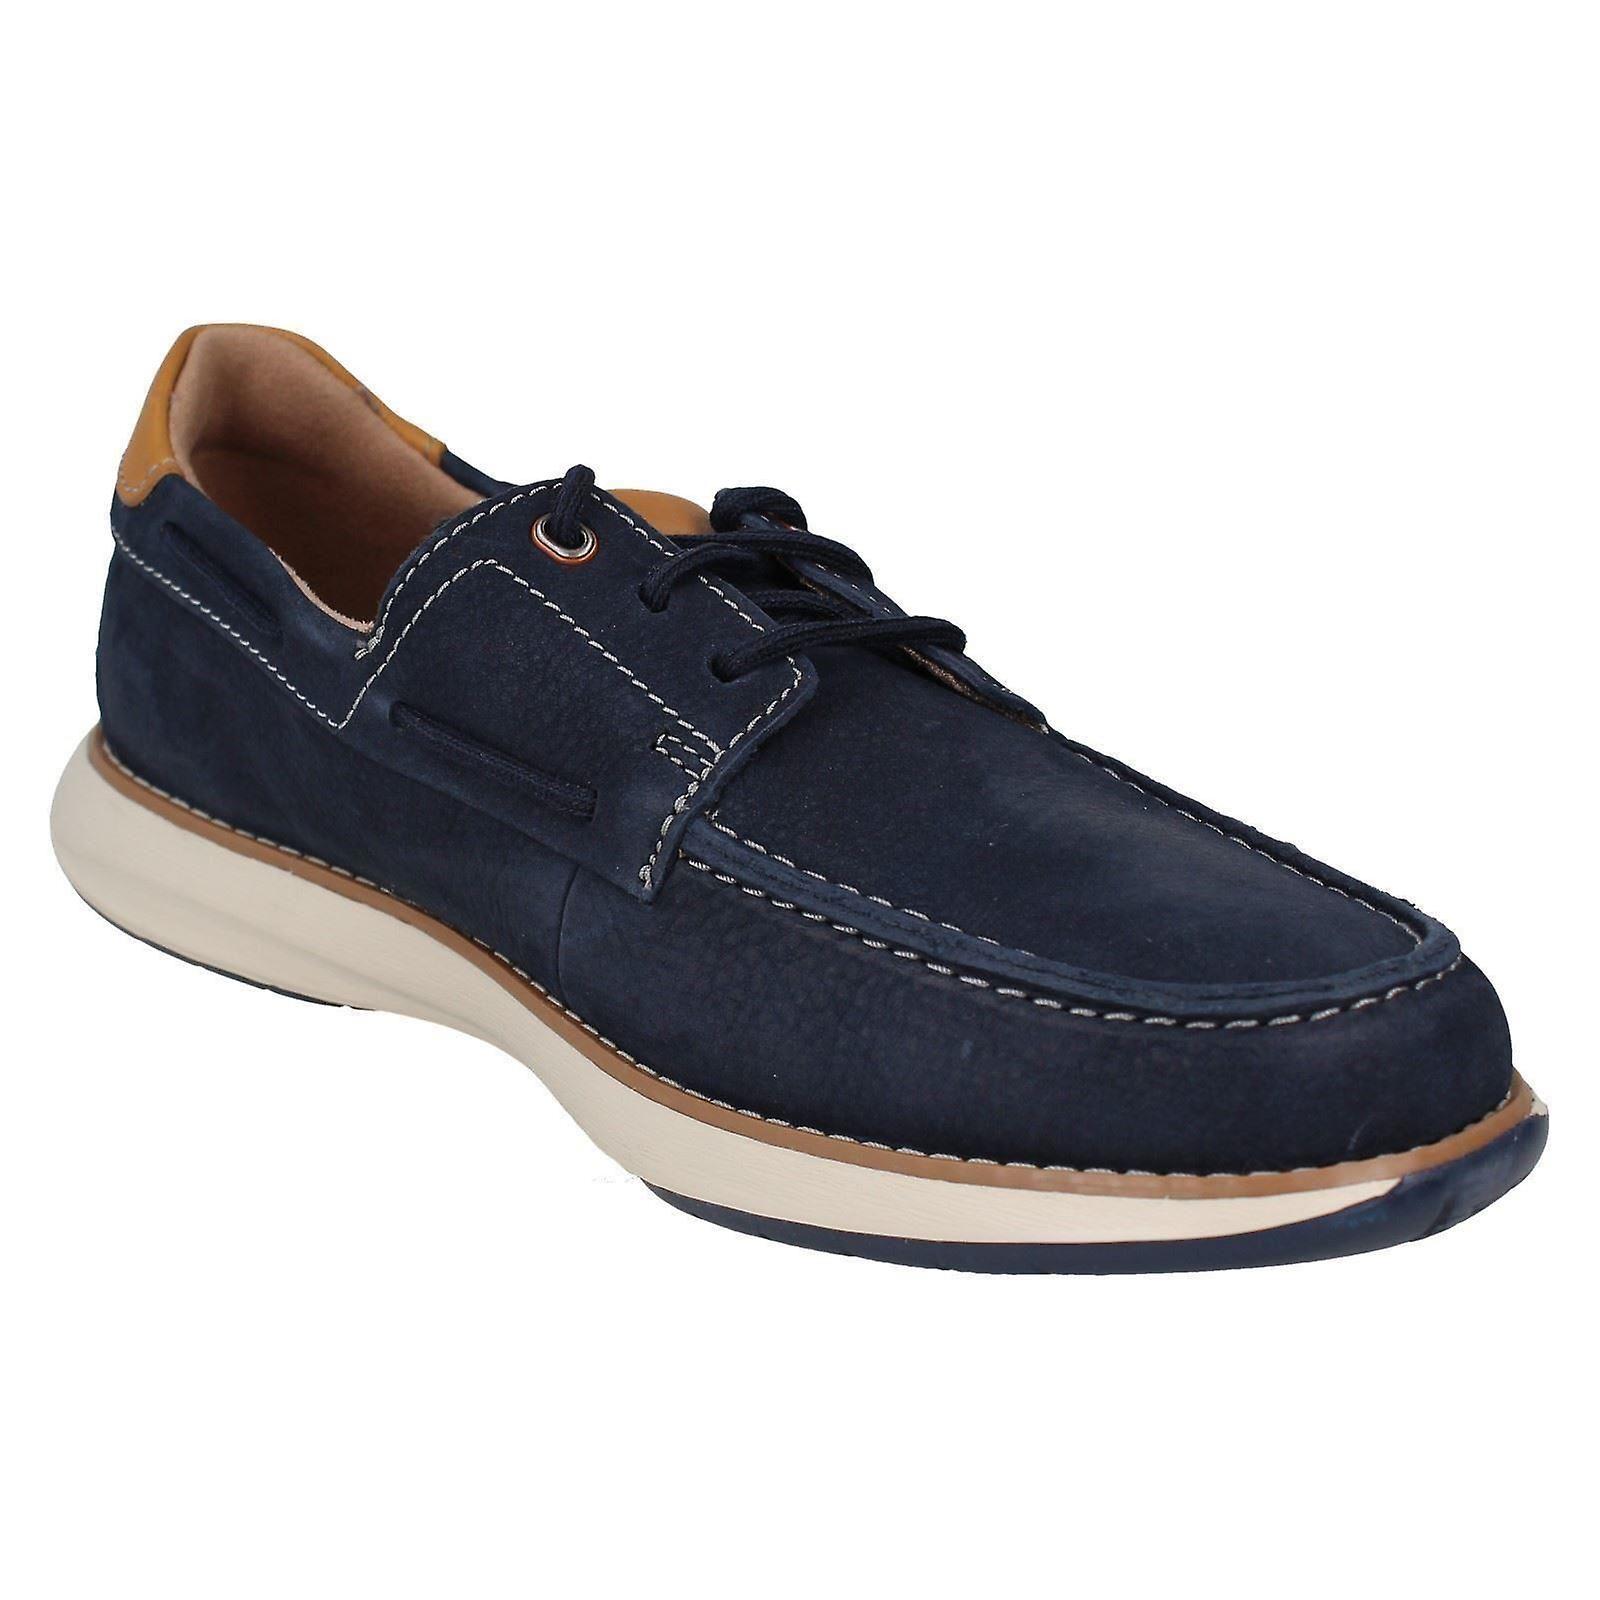 Mens Unstructured By Clarks Lace Up Casual Shoes Un Pilot